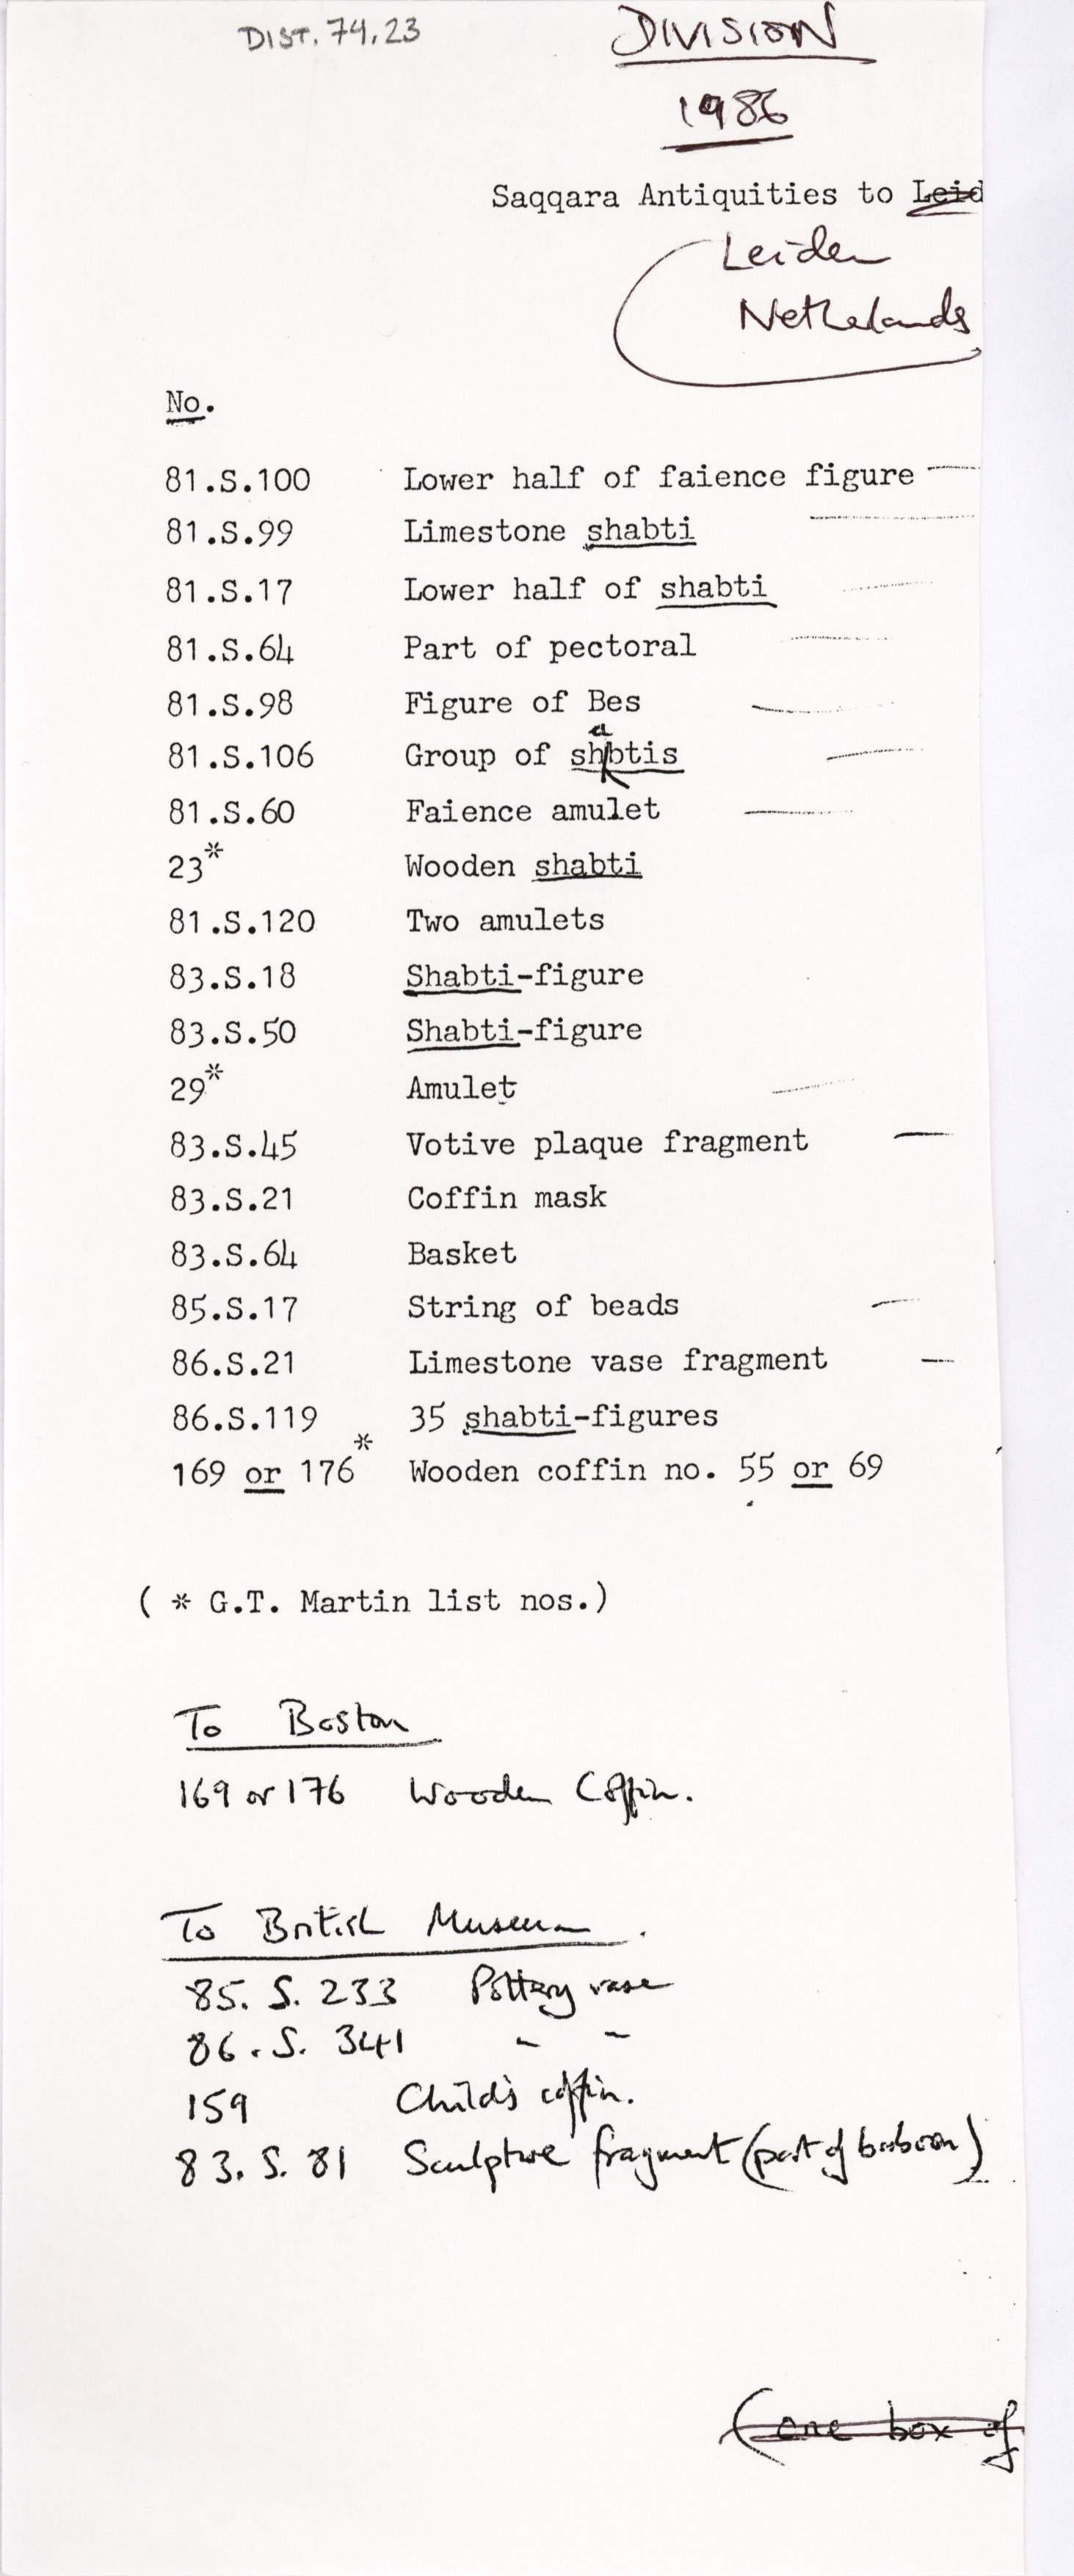 1986-2001 Saqqara, Qasr Ibrim and Memphis DIST.74.23